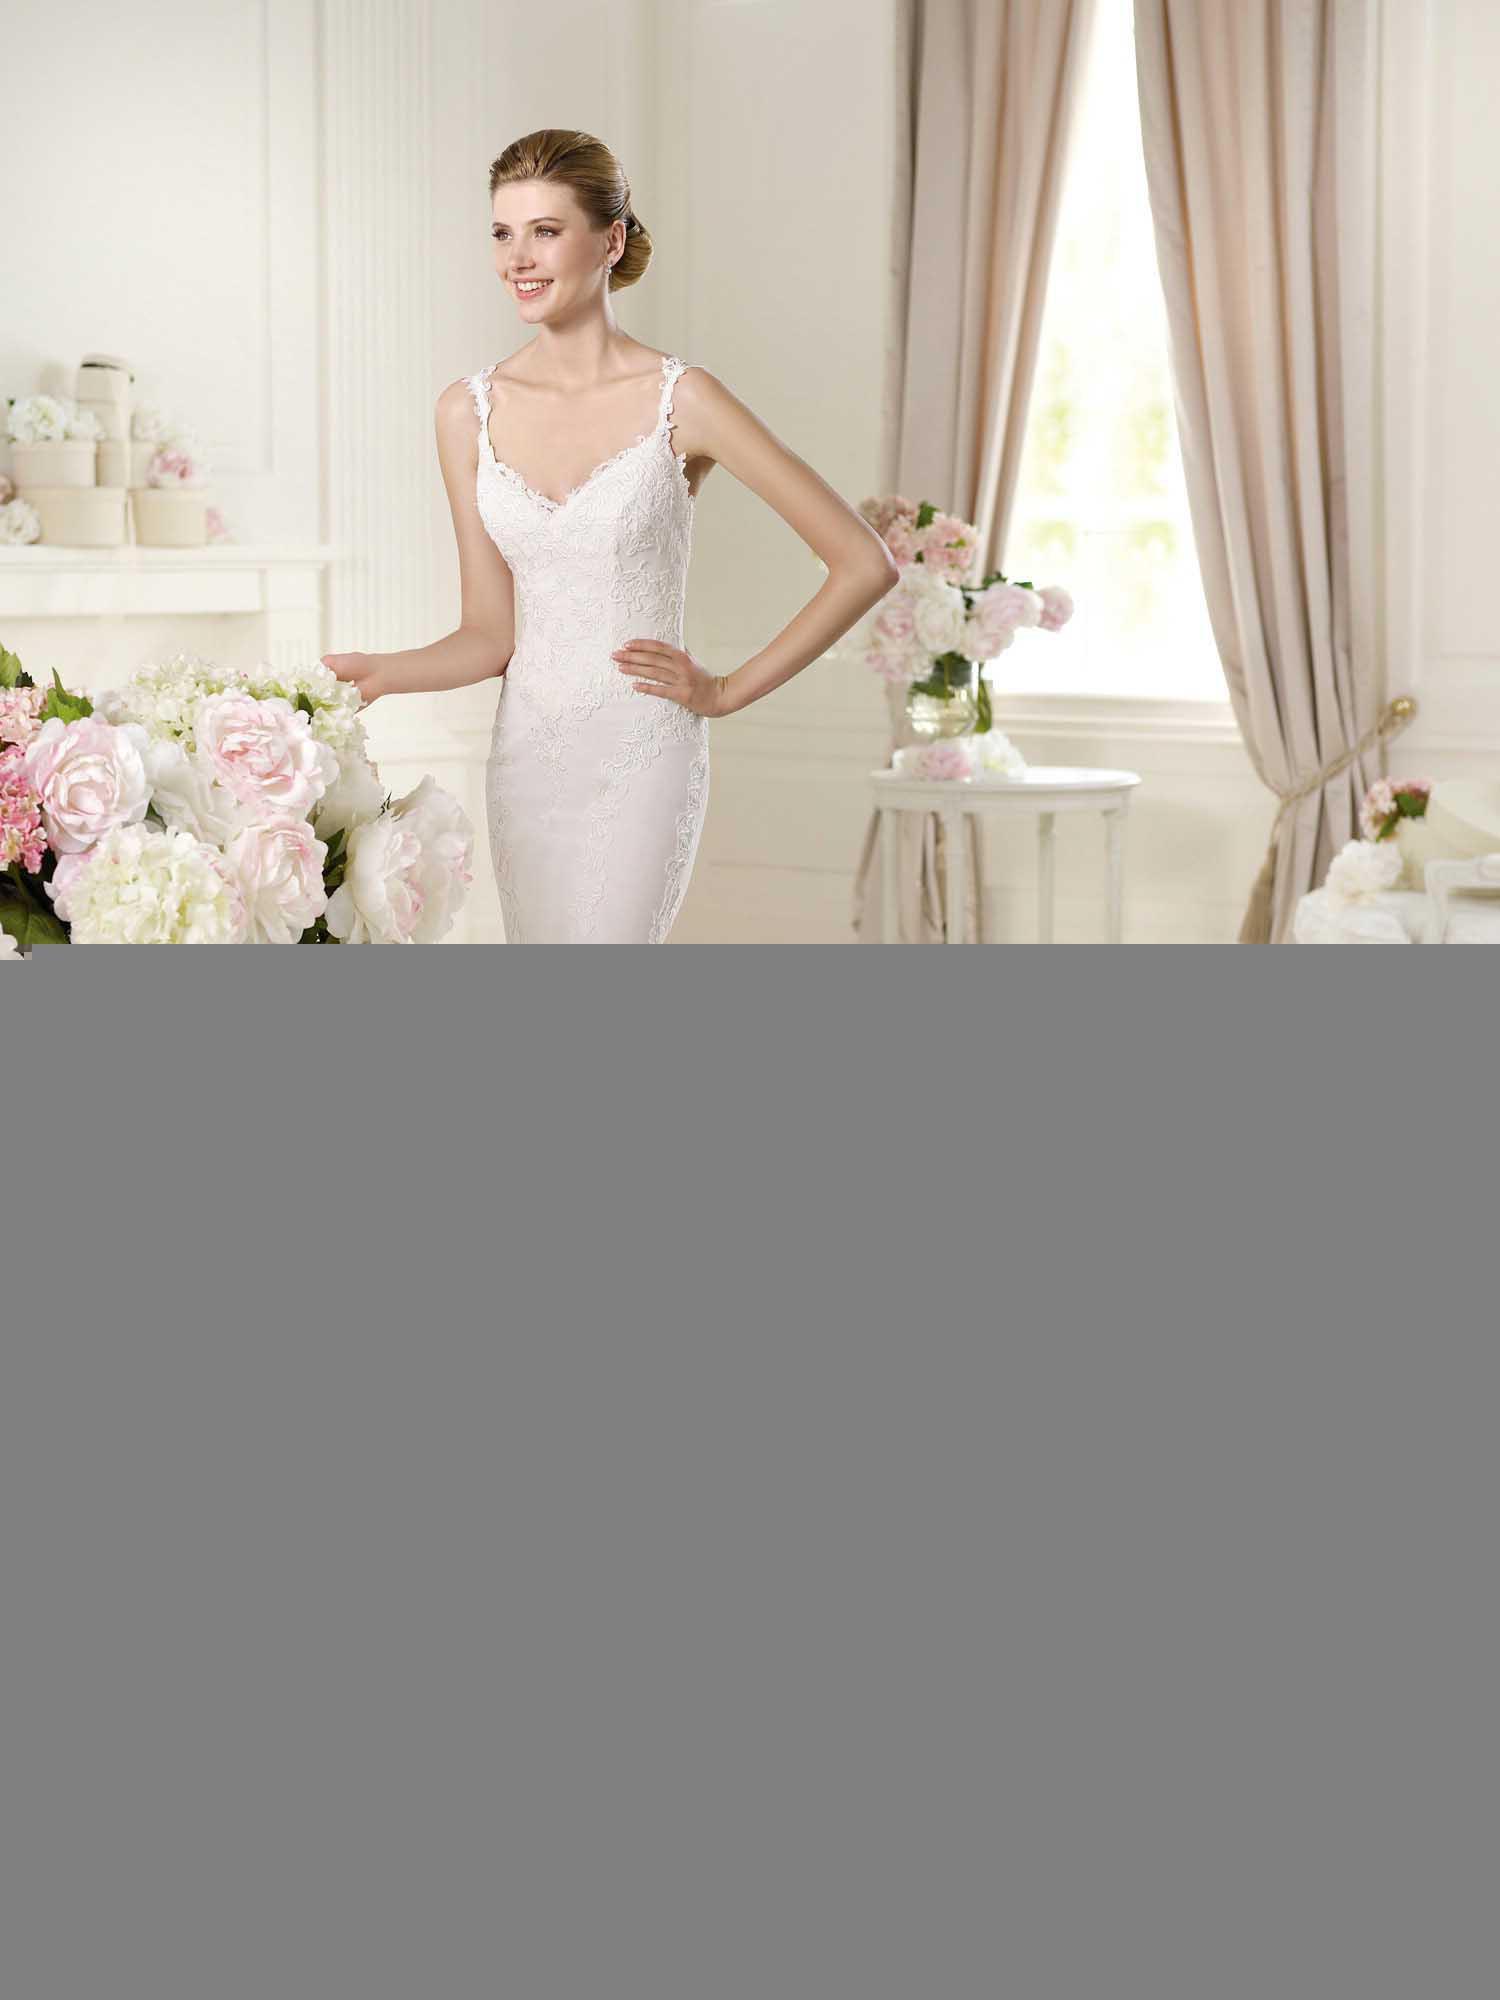 Spaghetti Strap Mermaid Wedding Dress  Simple Spaghetti Straps Mermaid Lace Embroidery With Long